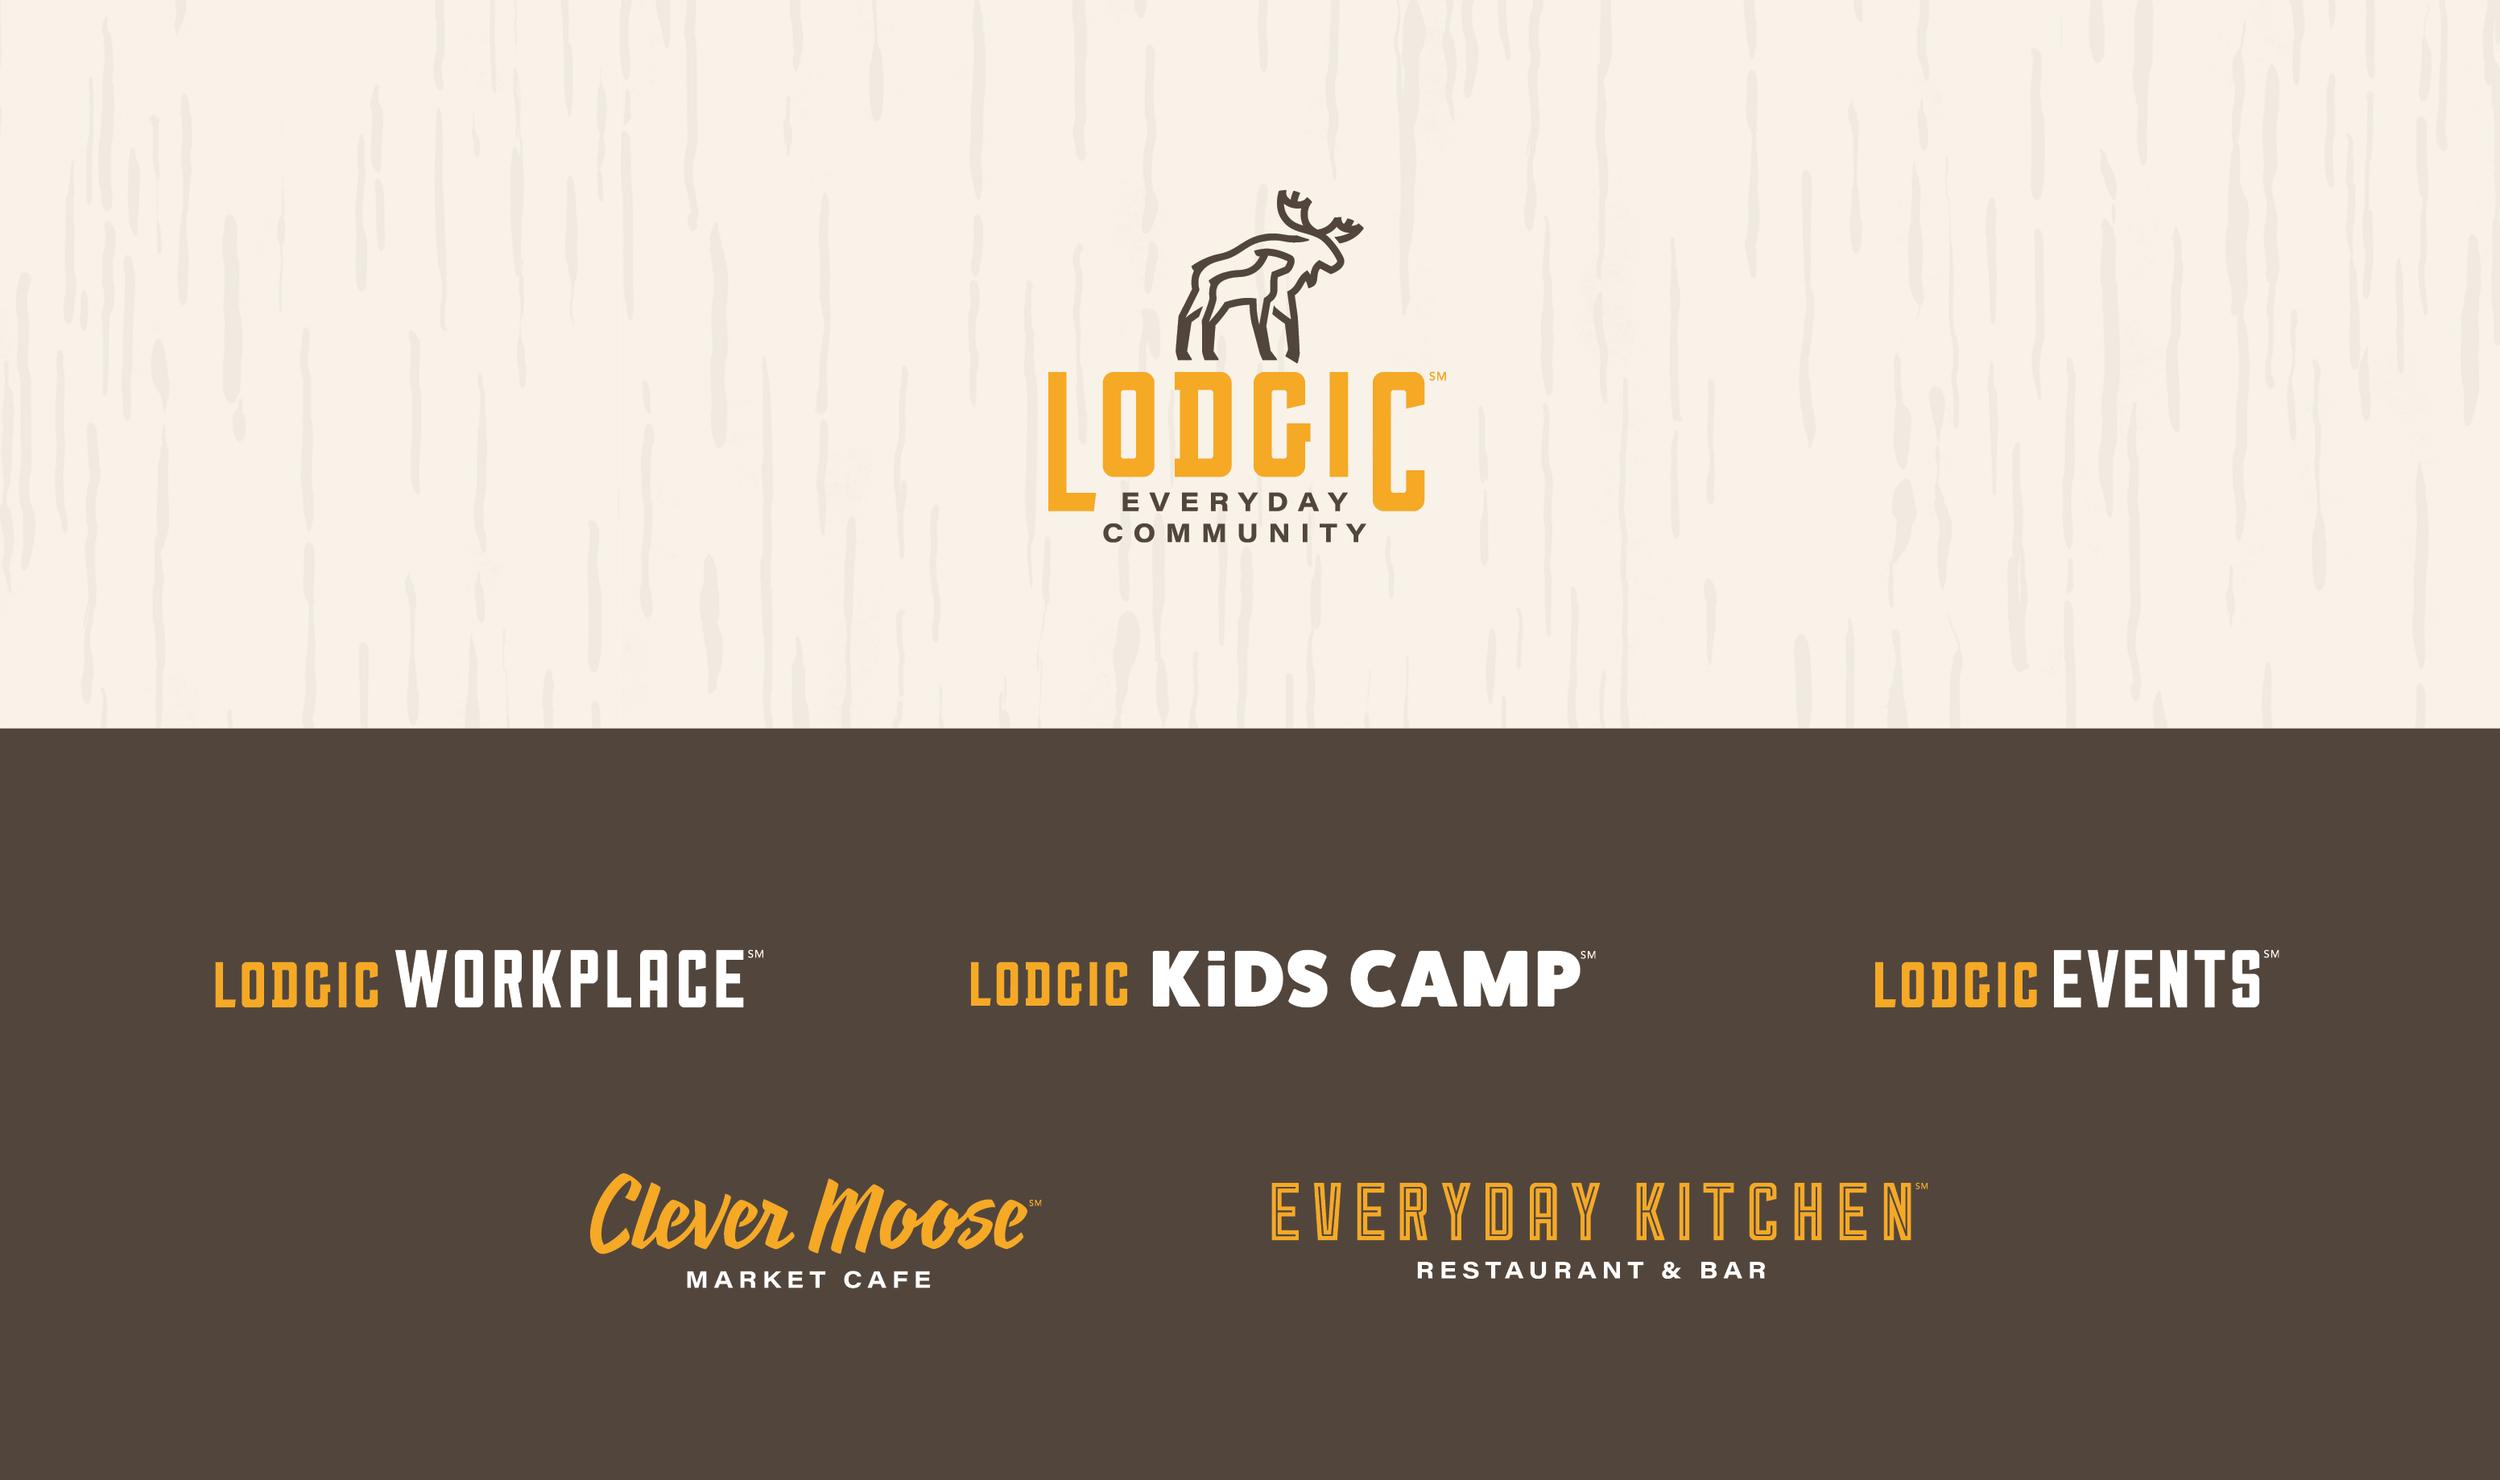 Lodgic_logo_family_v2.png